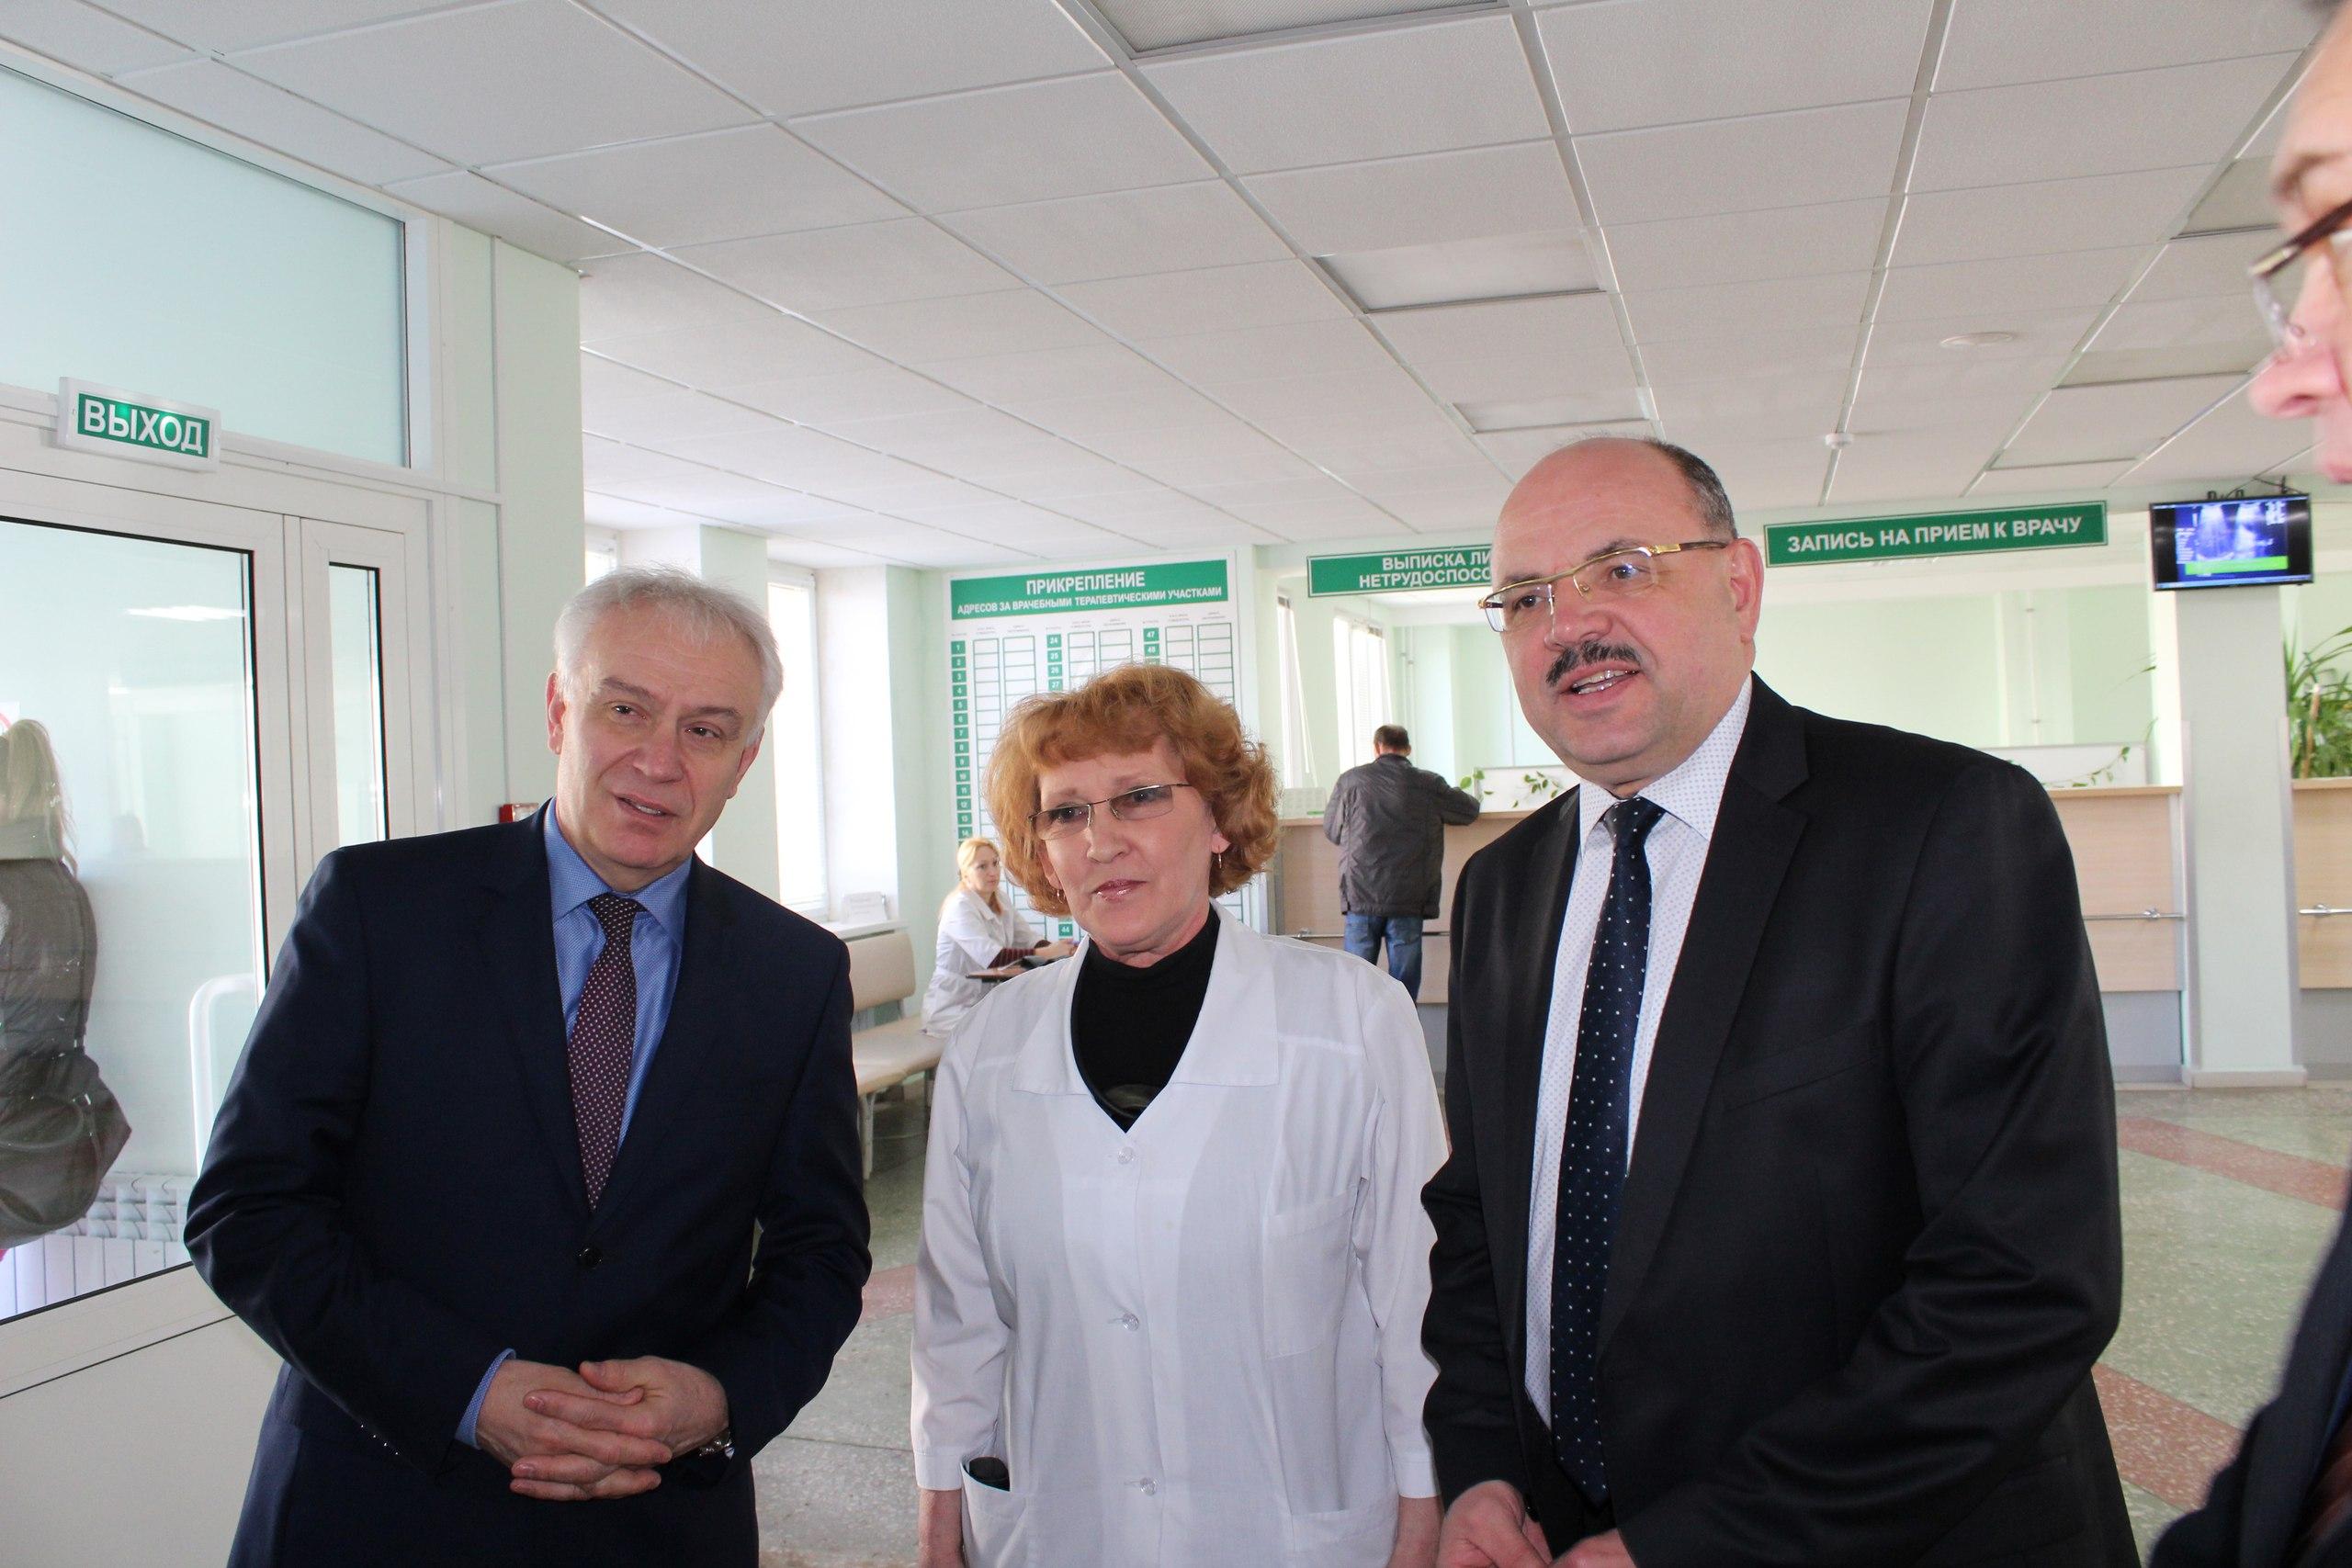 Бойцов сергей анатольевич член корреспондент